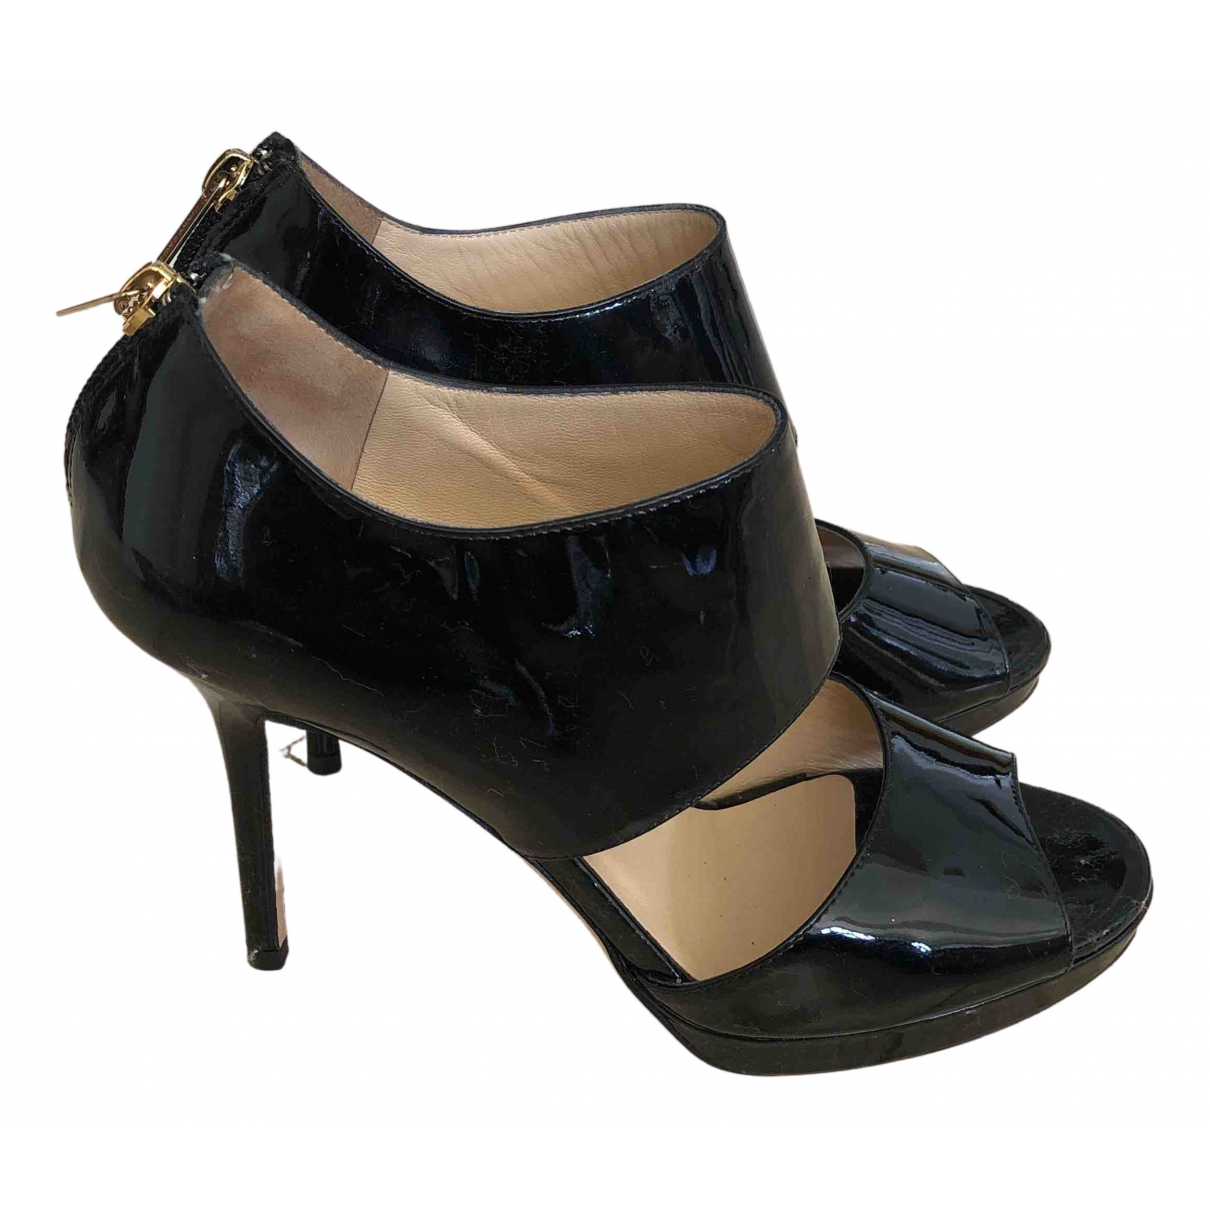 Jimmy Choo \N Black Patent leather Heels for Women 38 EU